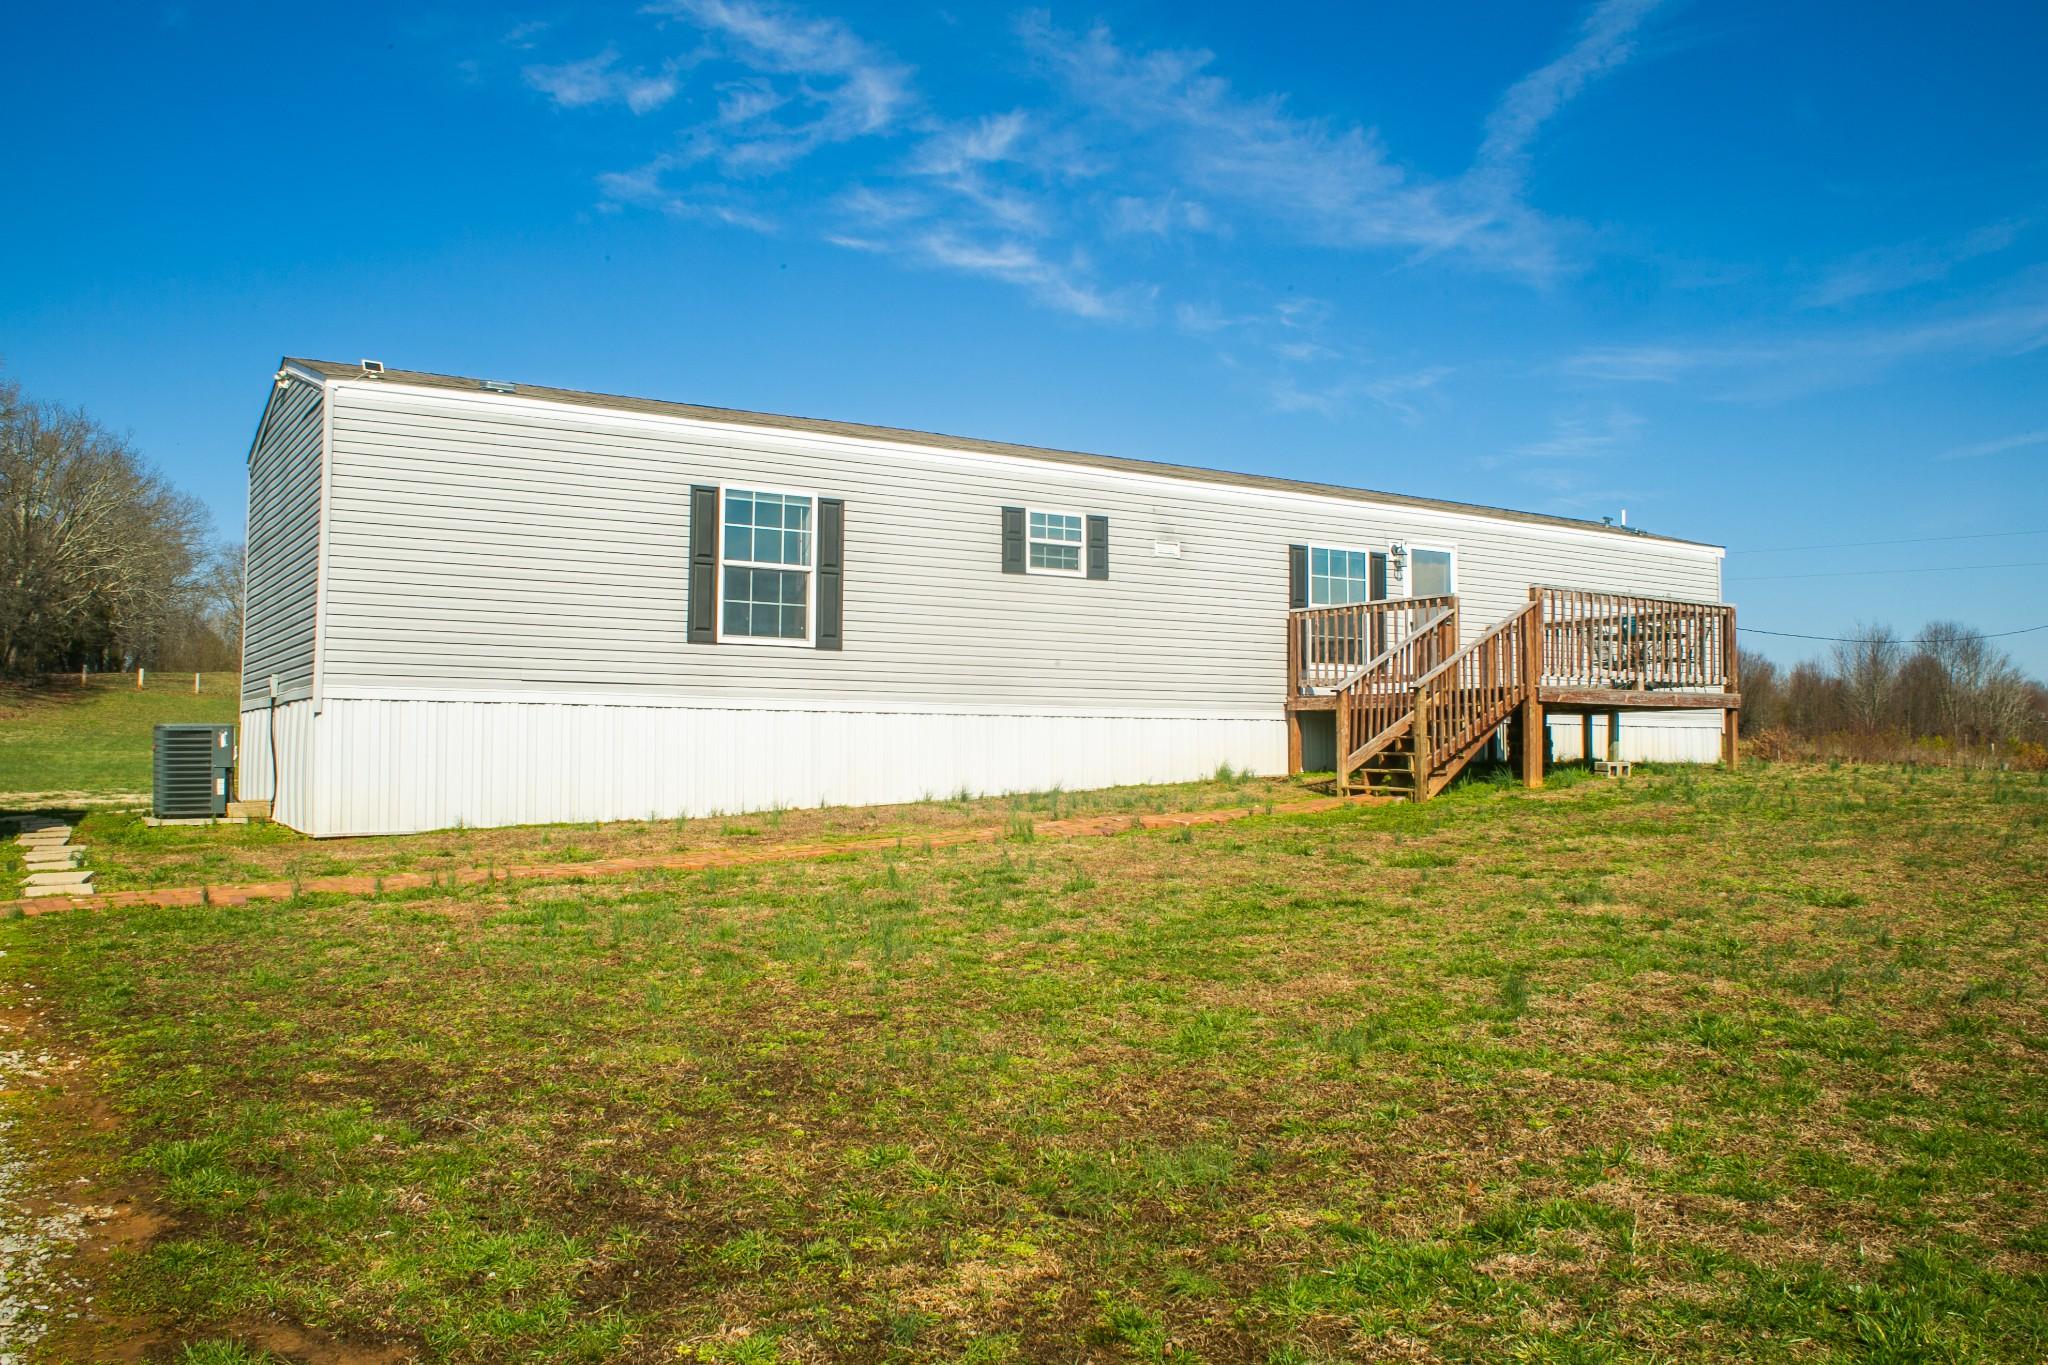 1044 Dr Fisher Rd, Mc Minnville, TN 37110 - Mc Minnville, TN real estate listing